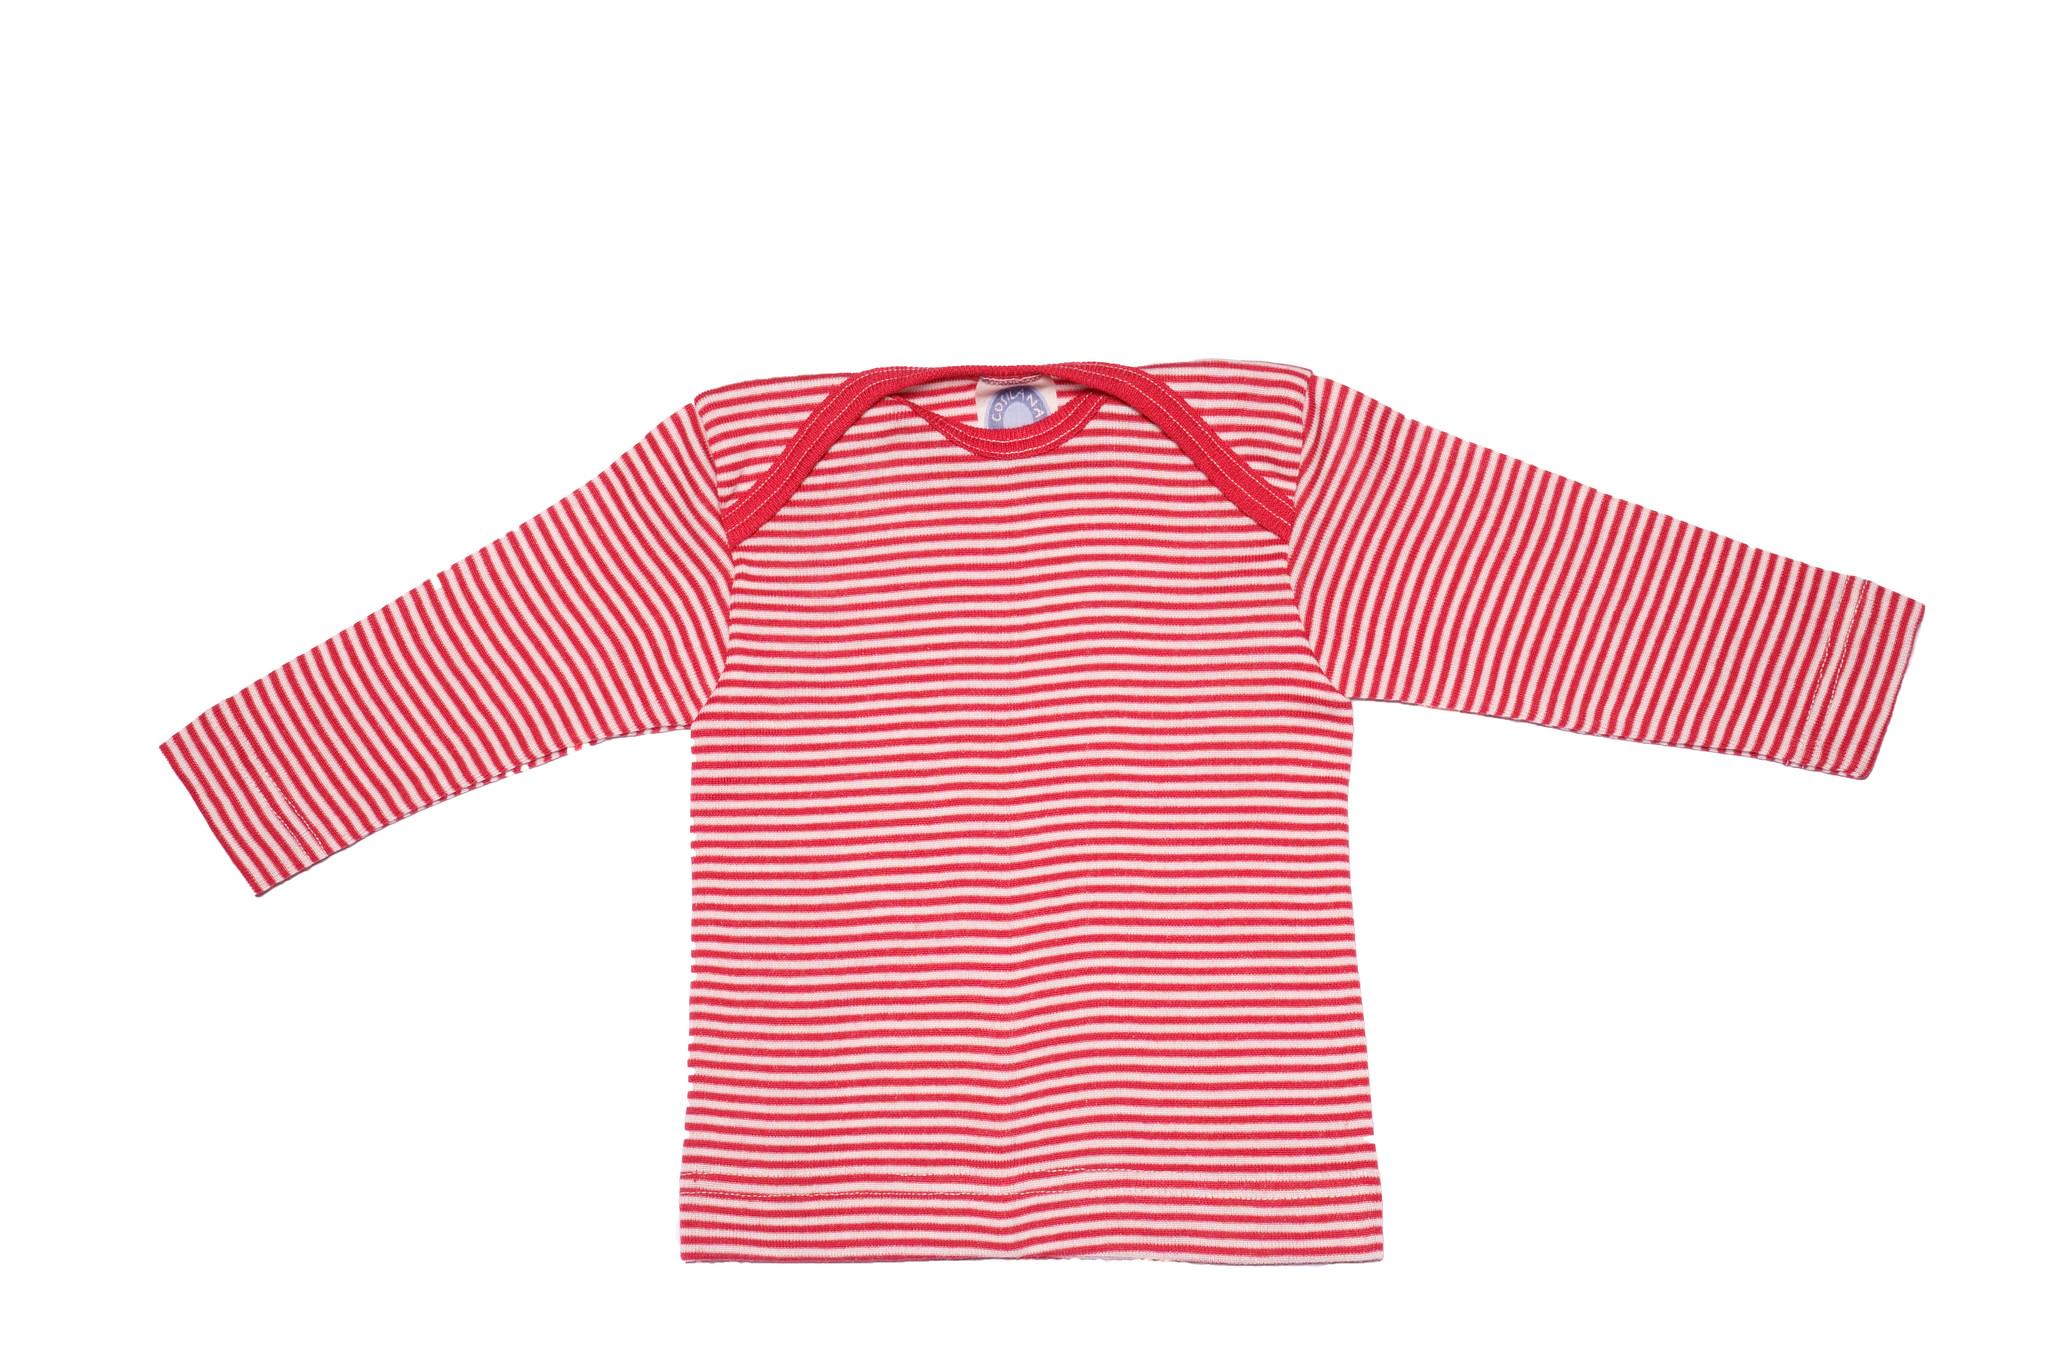 Cosilana Cosilana Babyhemdje Wol/Zijde lange mouw - Gestreept Rood (124) - CopyaCosilana Babyhemdje Wol/Zijde lange mouw - Gestreept Bruin (125)